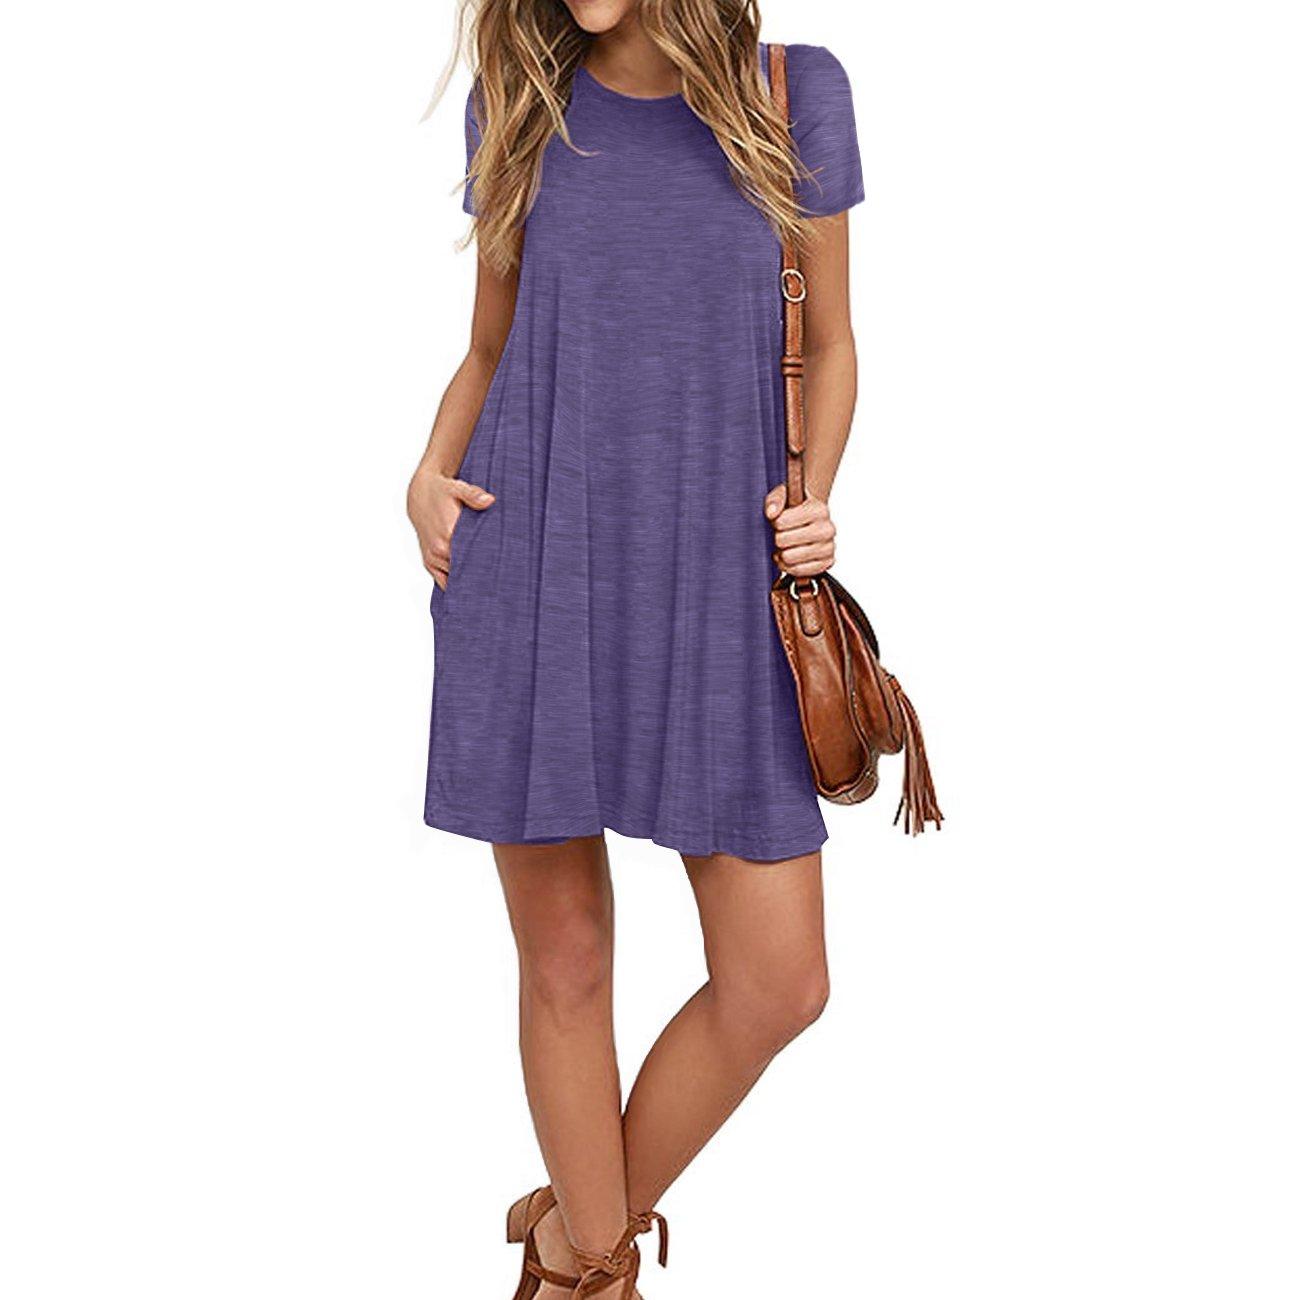 Naokenu Women Short Sleeve Swing Dress with Pockets Casual Loose T-Shirt Dress(S,Purple Gray) by Naokenu (Image #3)